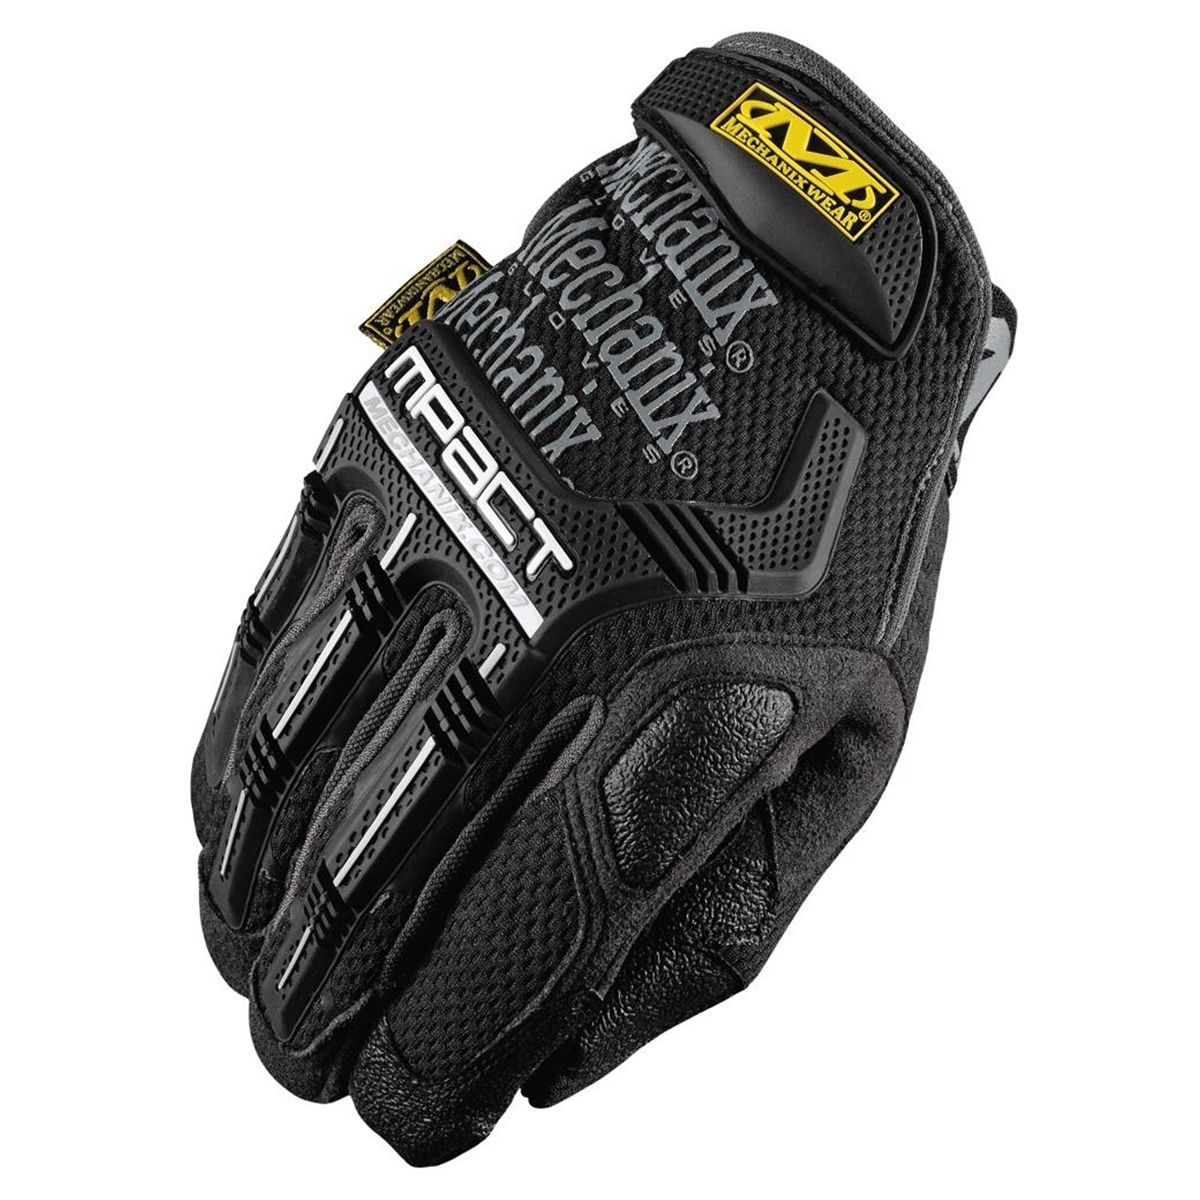 Black gloves races - Mpact Glove With Poron Xrd Black Grey Size Xlarge By Mechanix Wear